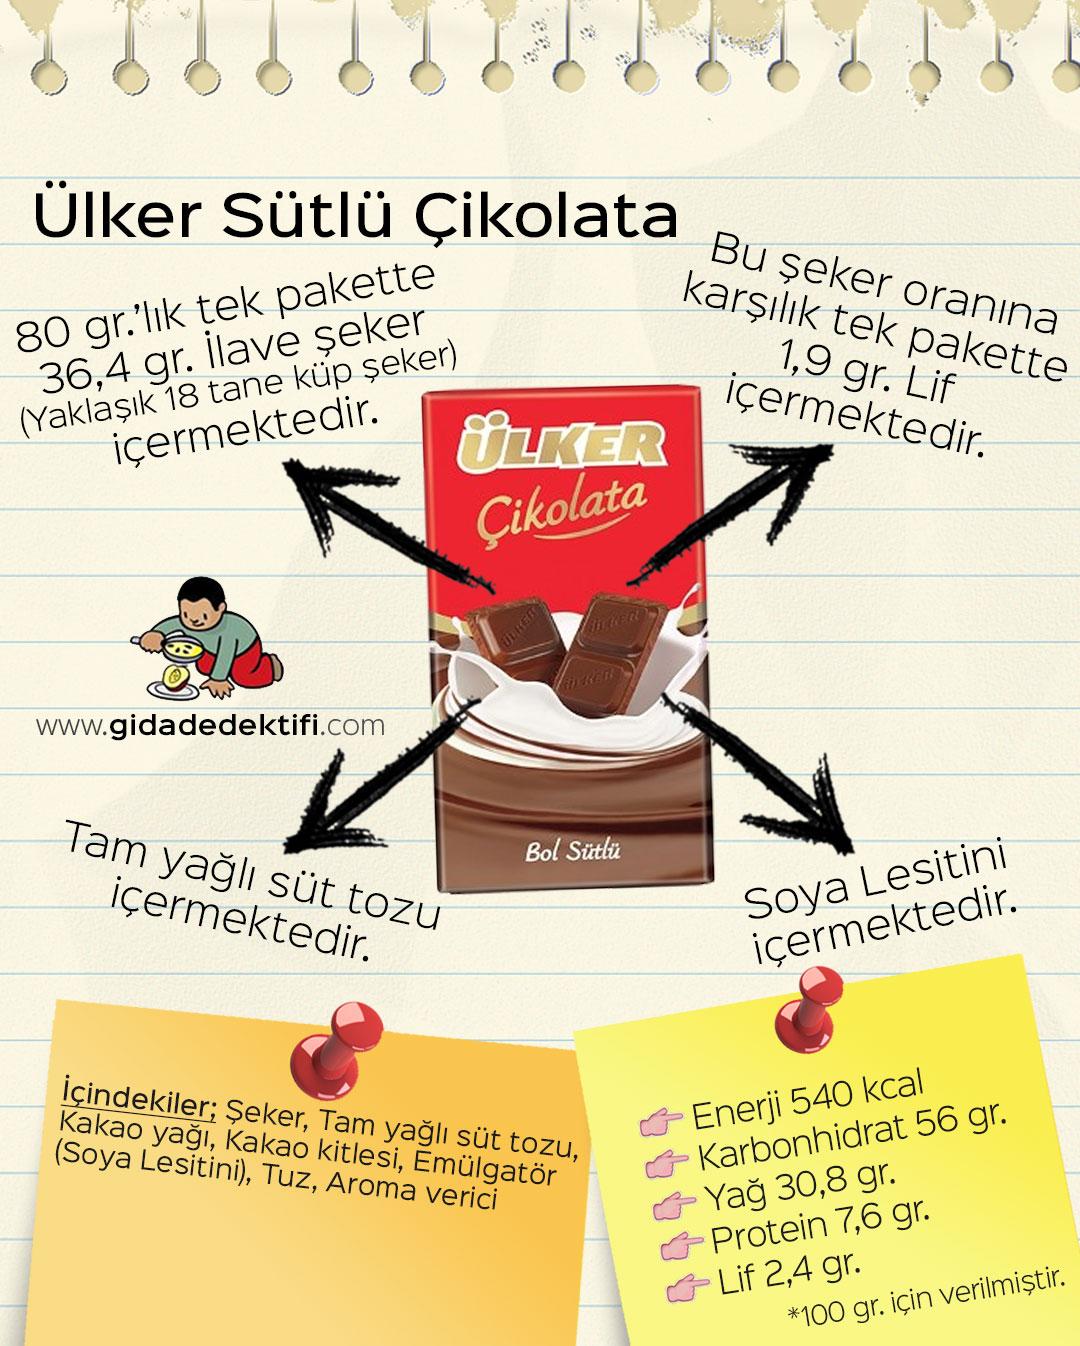 lker-Çikolata-1